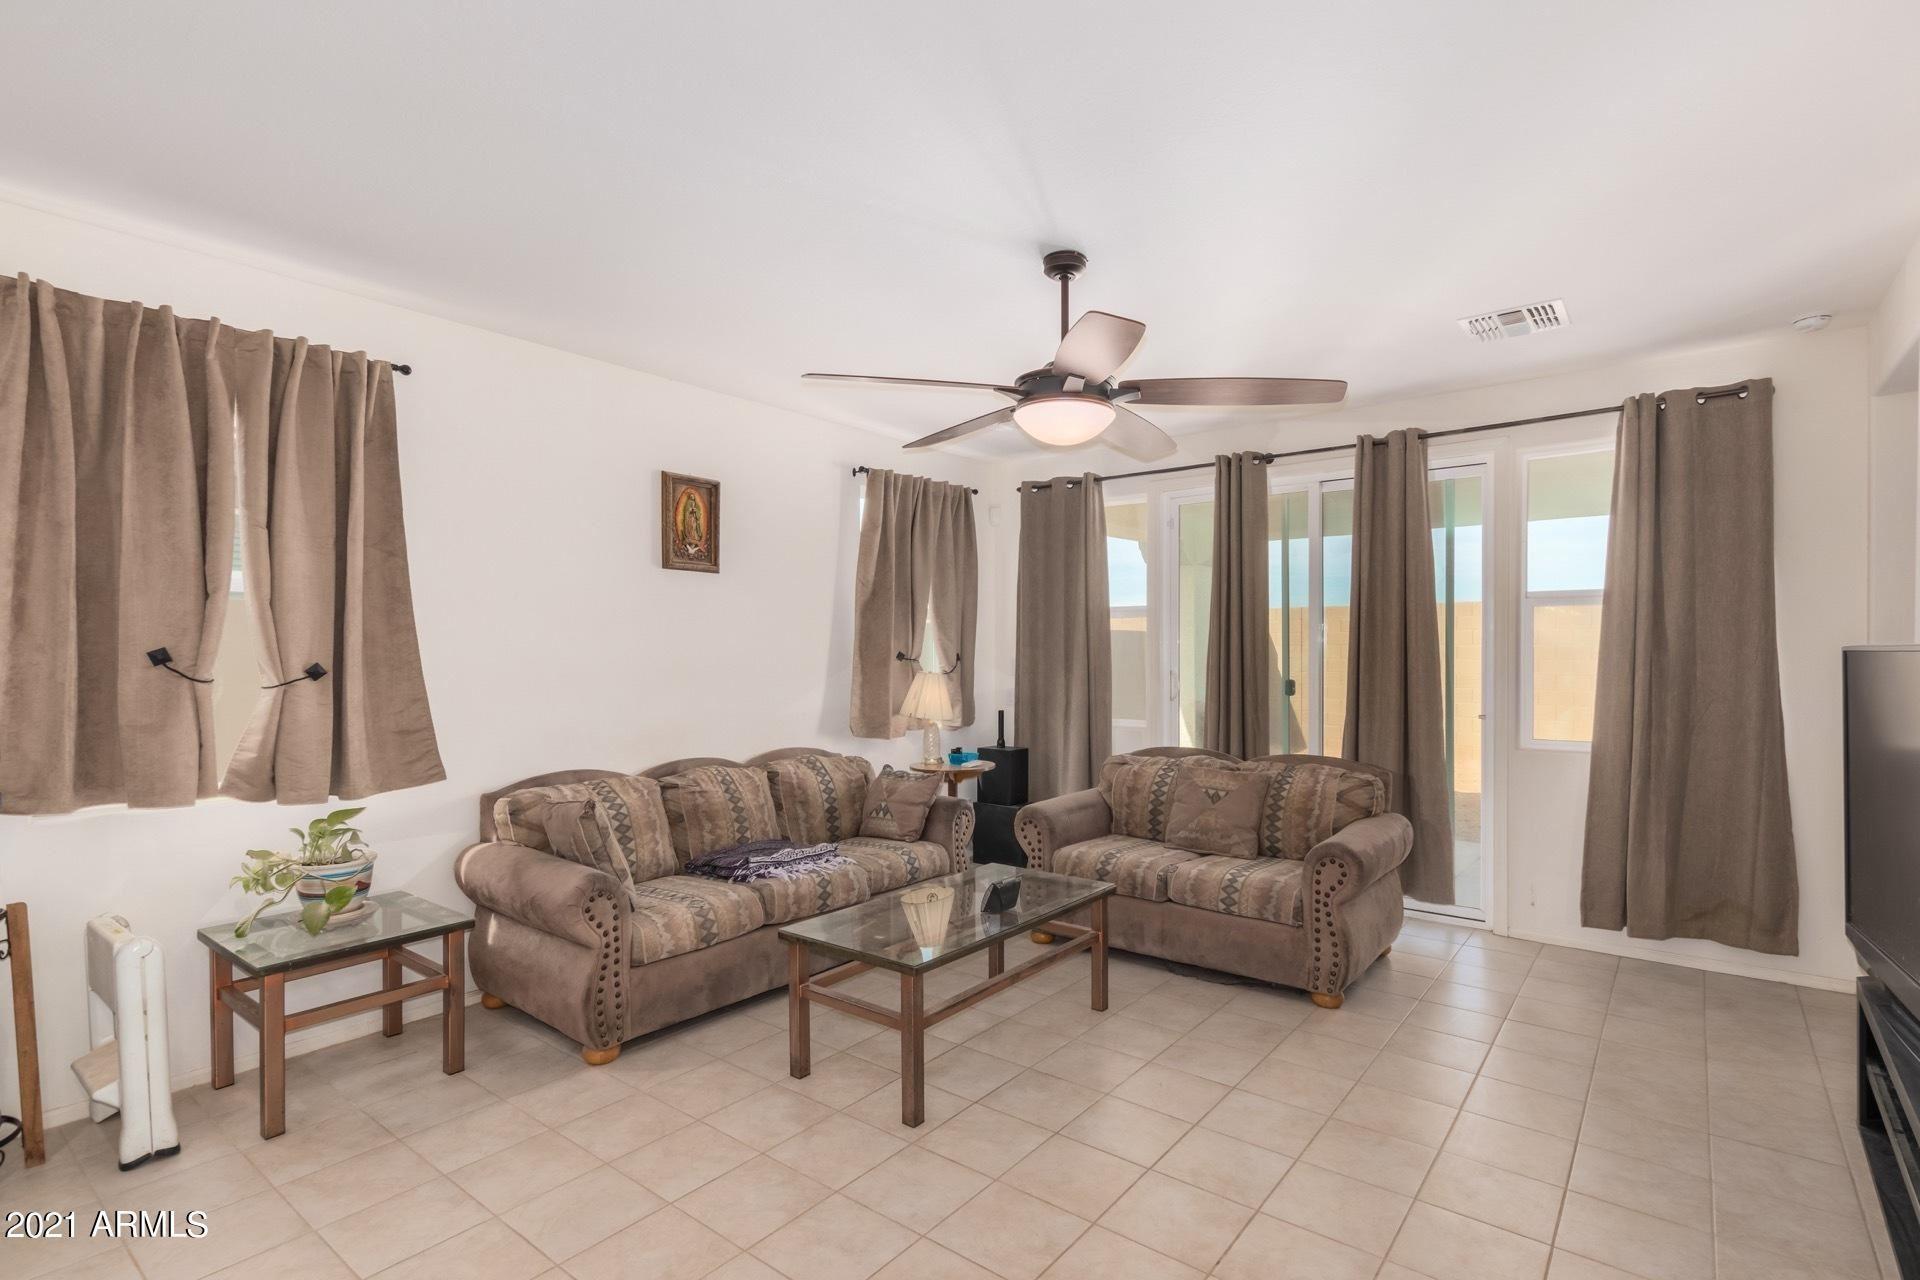 Photo of 10344 W YUMA Street, Tolleson, AZ 85353 (MLS # 6188636)